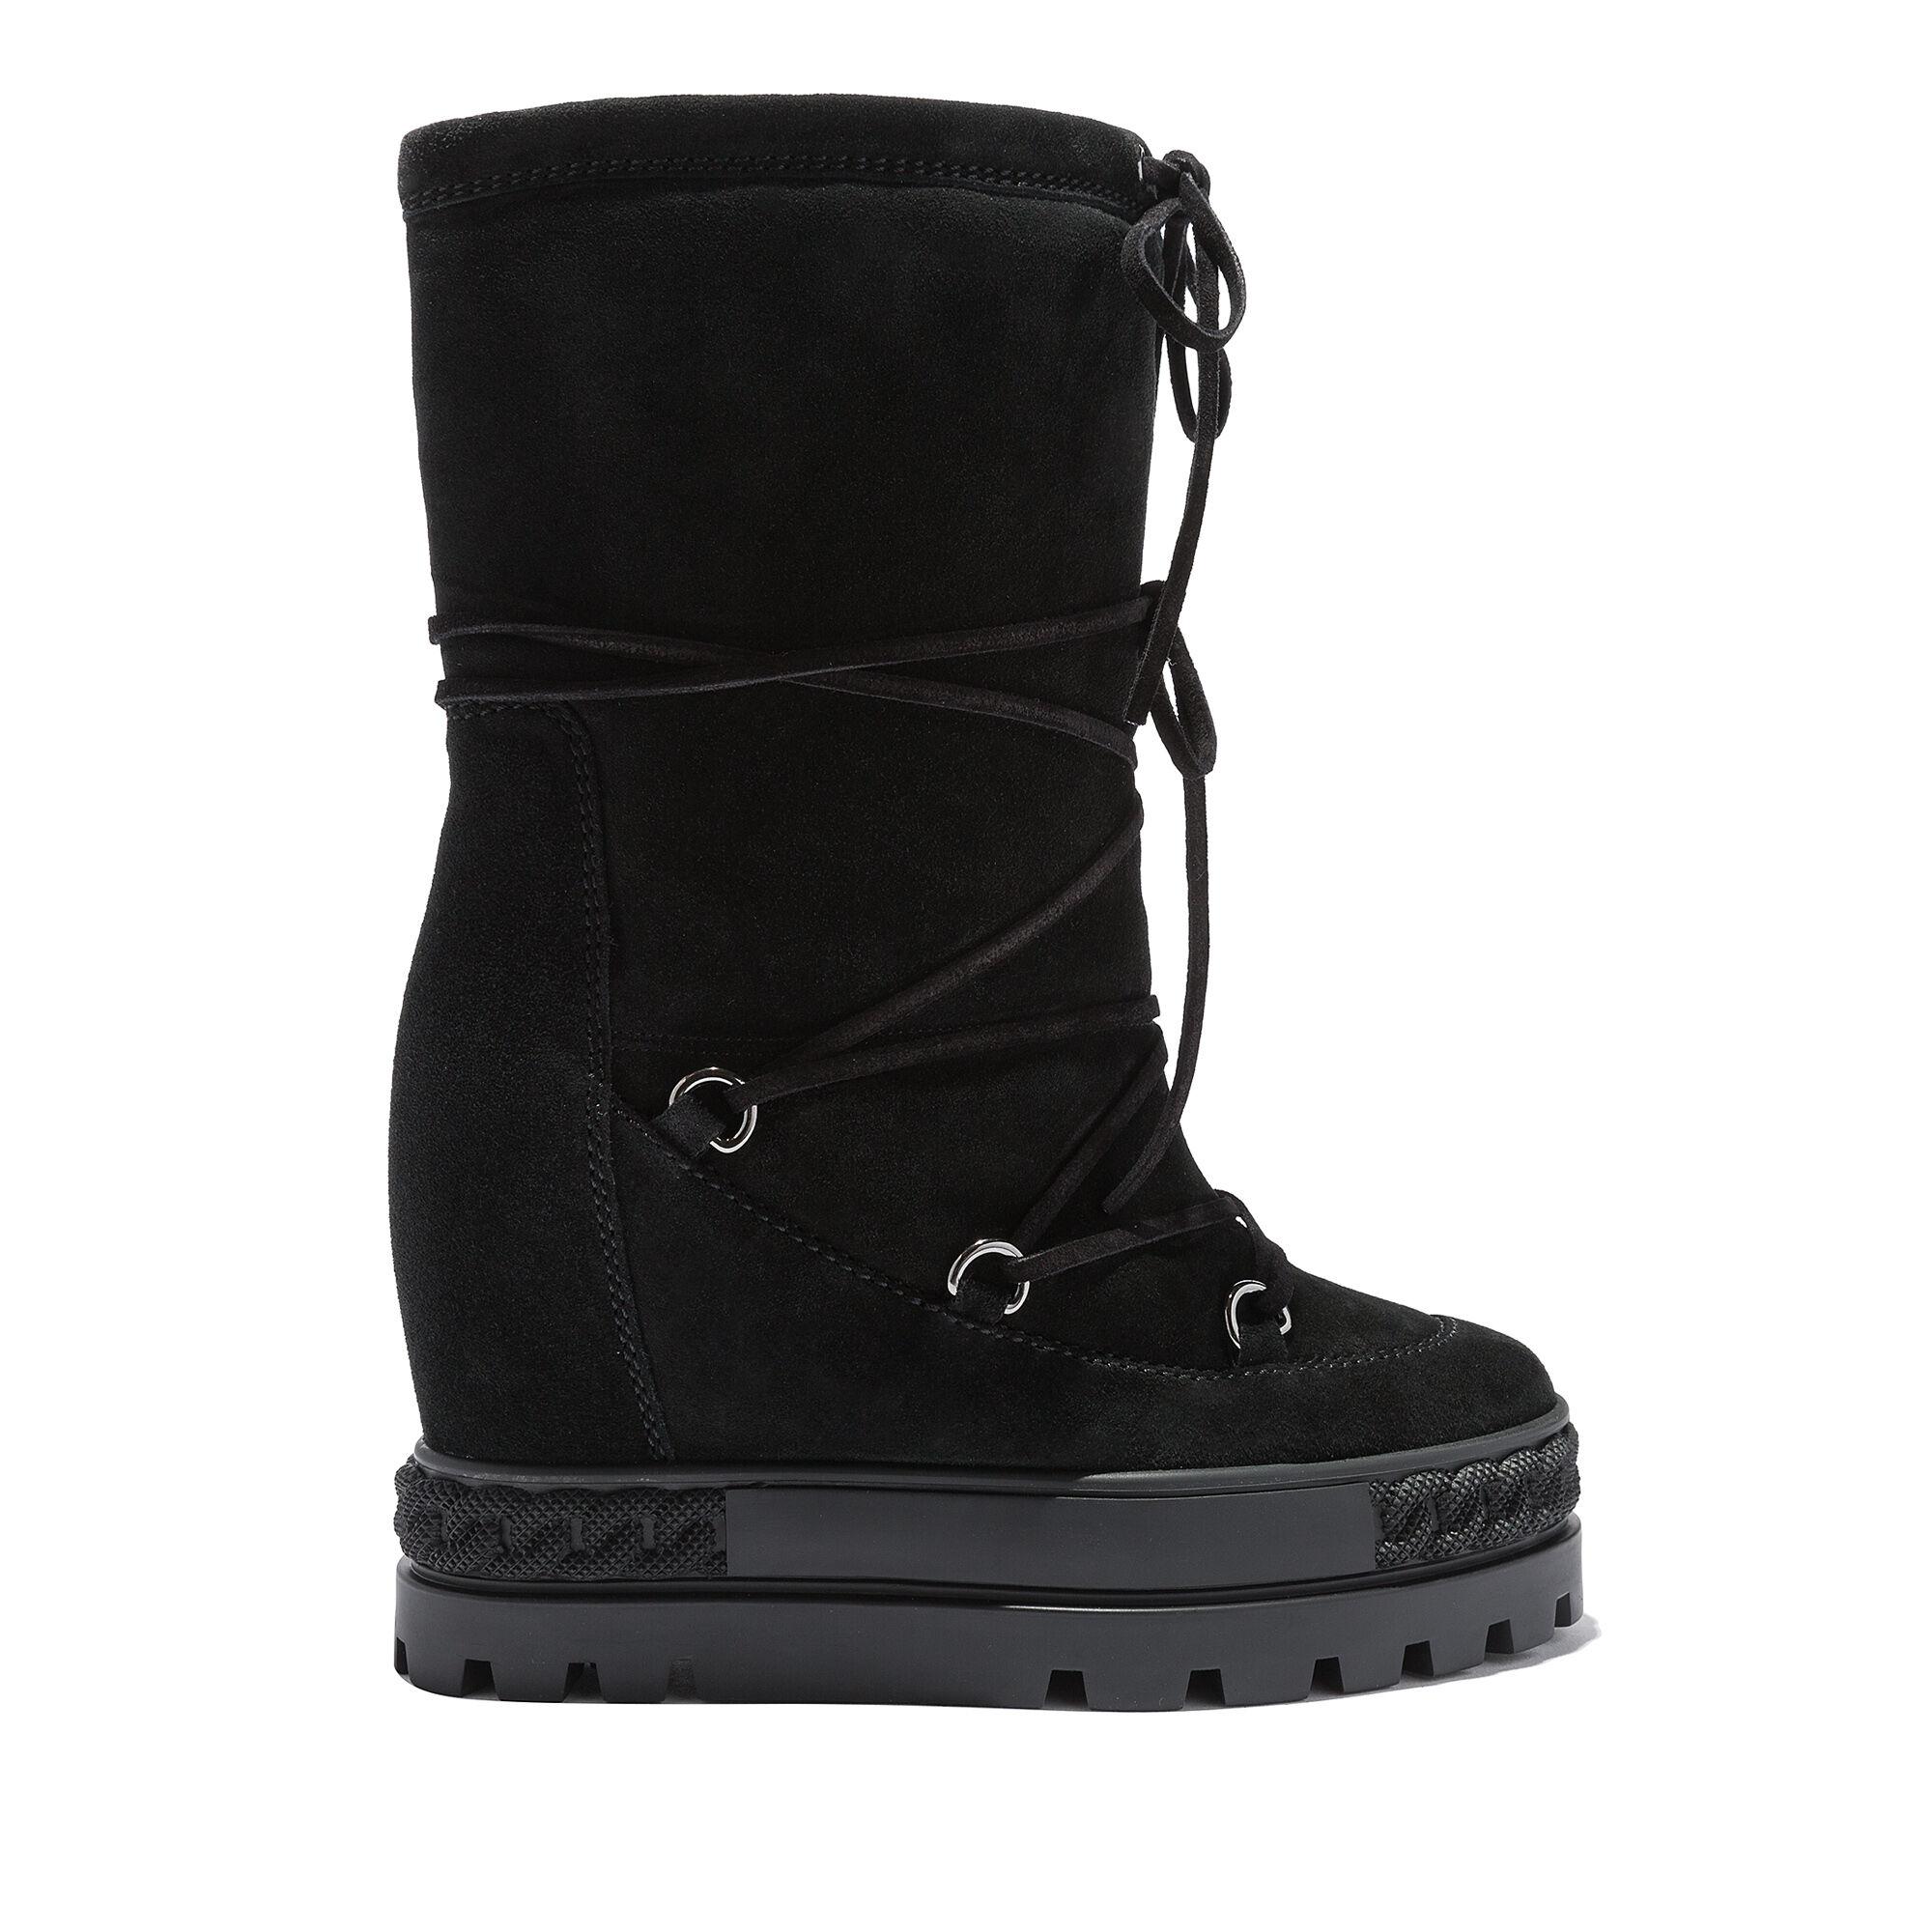 Pour Femme Sneakers De Casadei Luxe xAqx08YZ